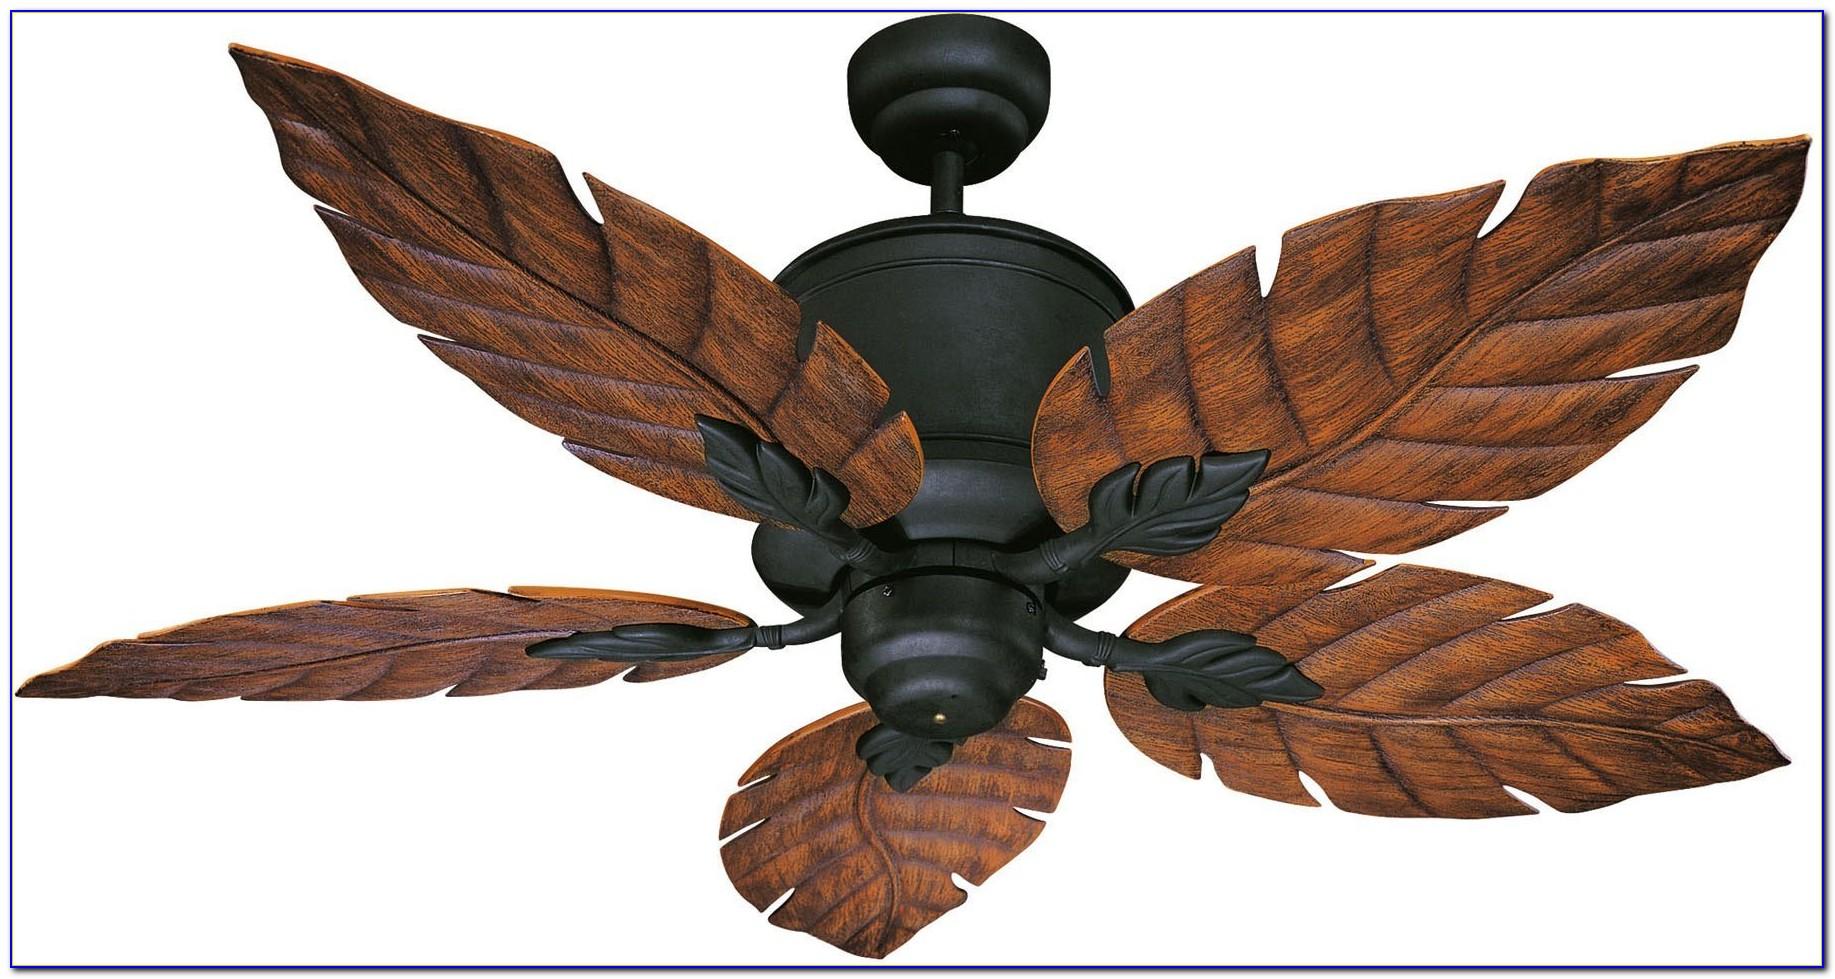 Harbor Breeze Leaf Blade Ceiling Fan